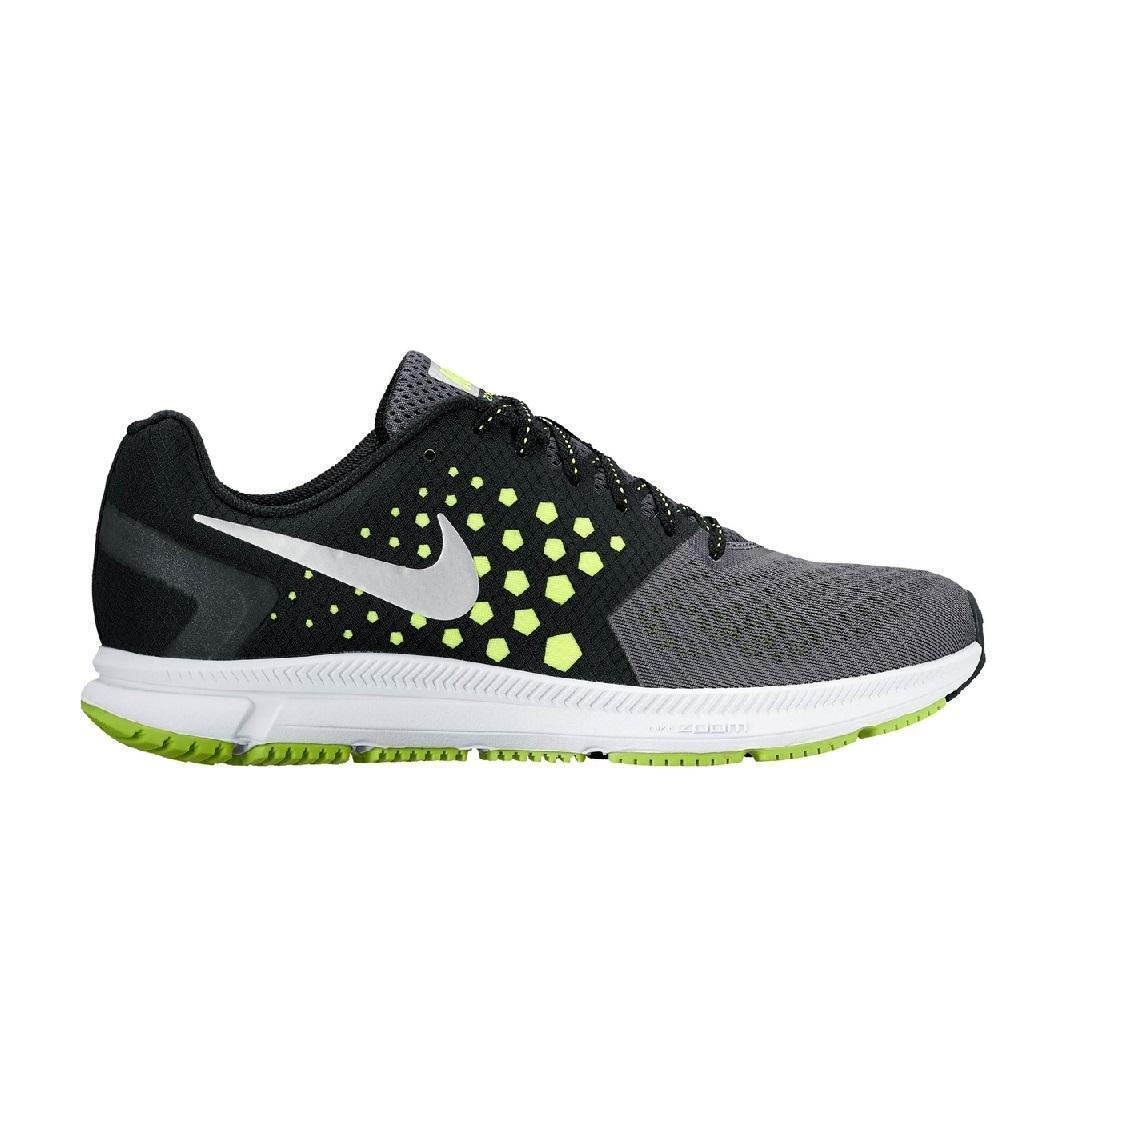 Mens NIKE ZOOM SPAM Black Running Trainers 852437 007